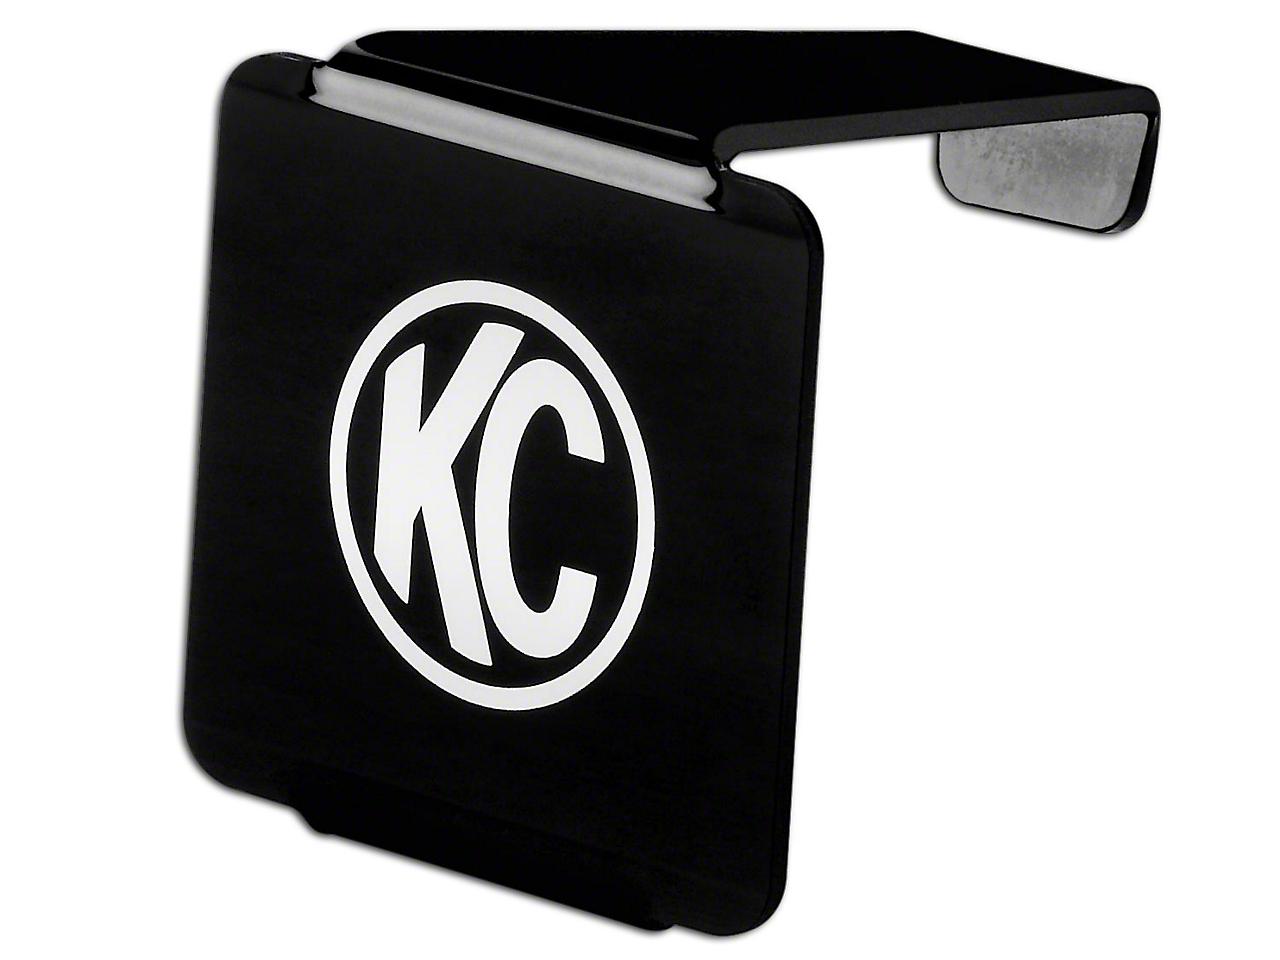 KC HiLiTES Hard Cover for 3 in. LZR Cube Light - Black (07-18 Silverado 1500)